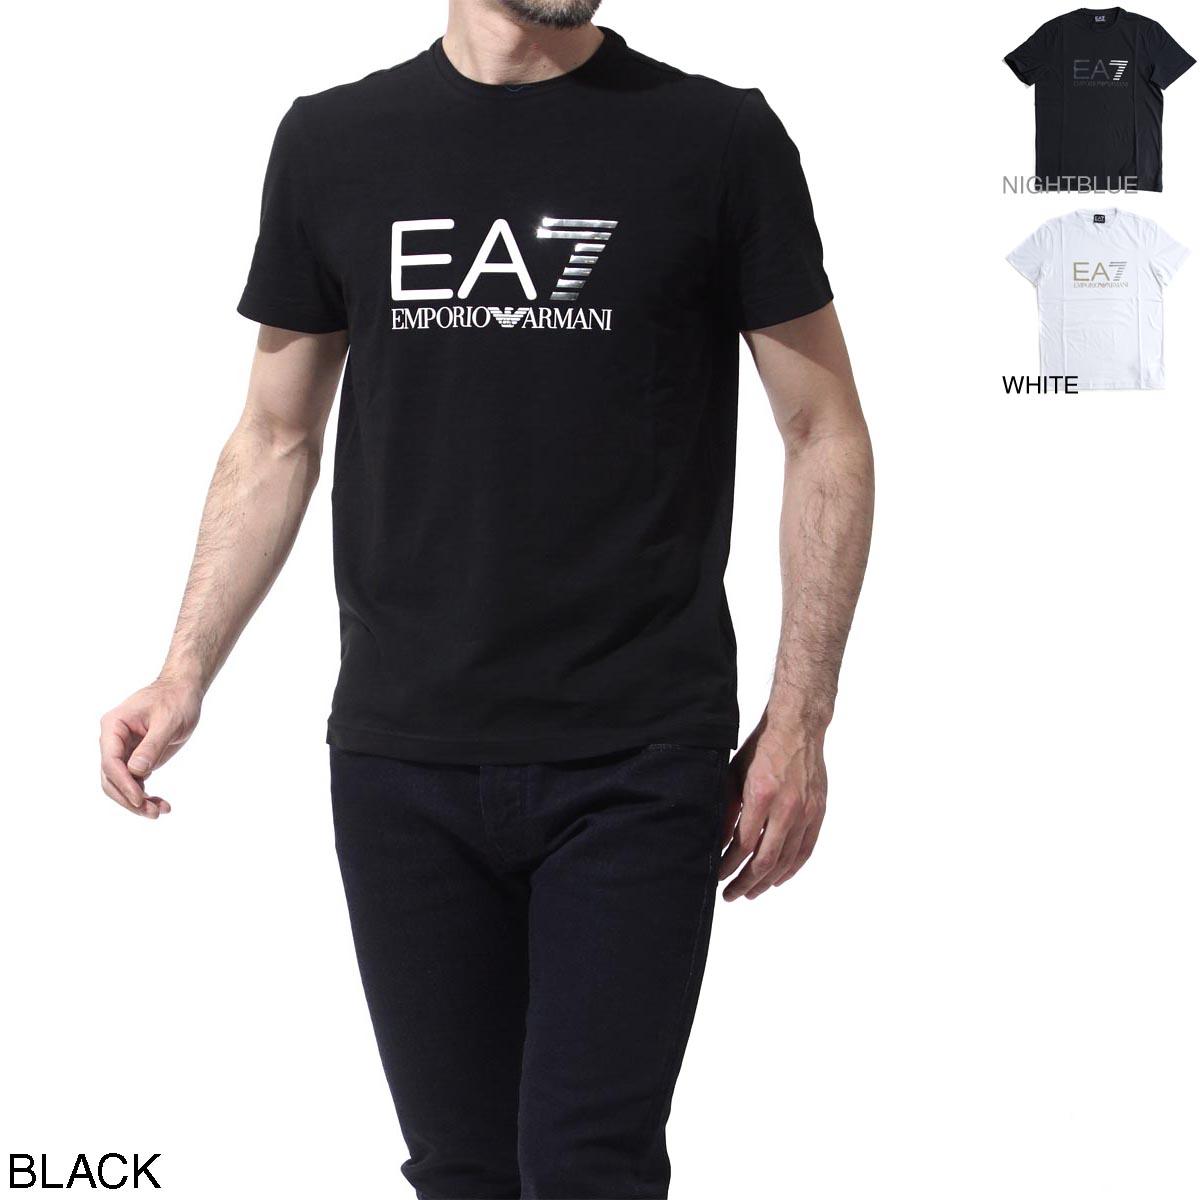 armani ea7 t shirt black sale   OFF30% Discounts cc23e87f92